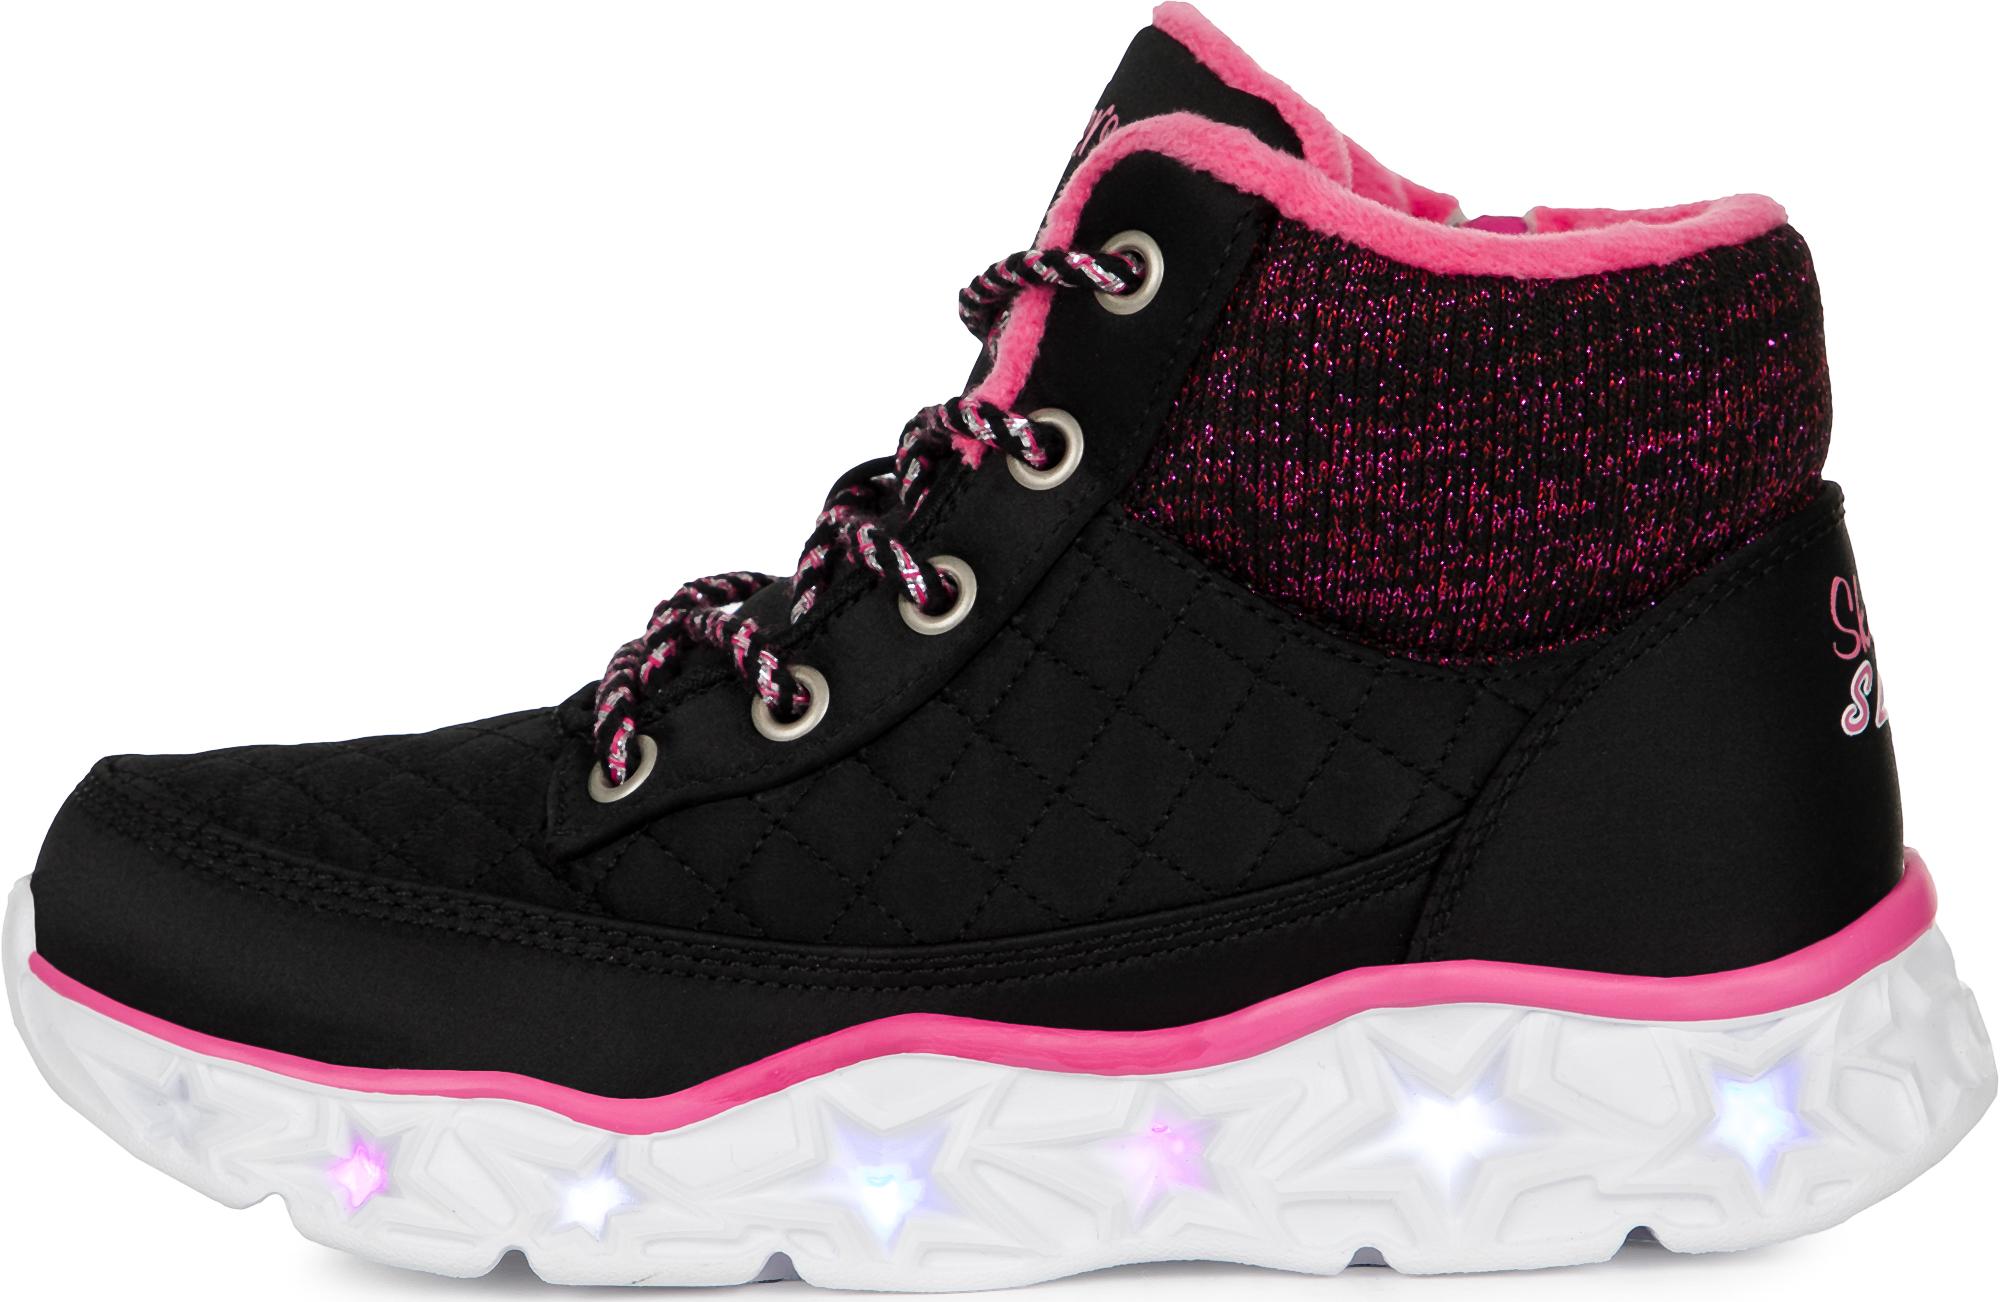 Skechers Ботинки утепленные для девочек Skechers Galaxy Lights-Snuggle Brights, размер 29